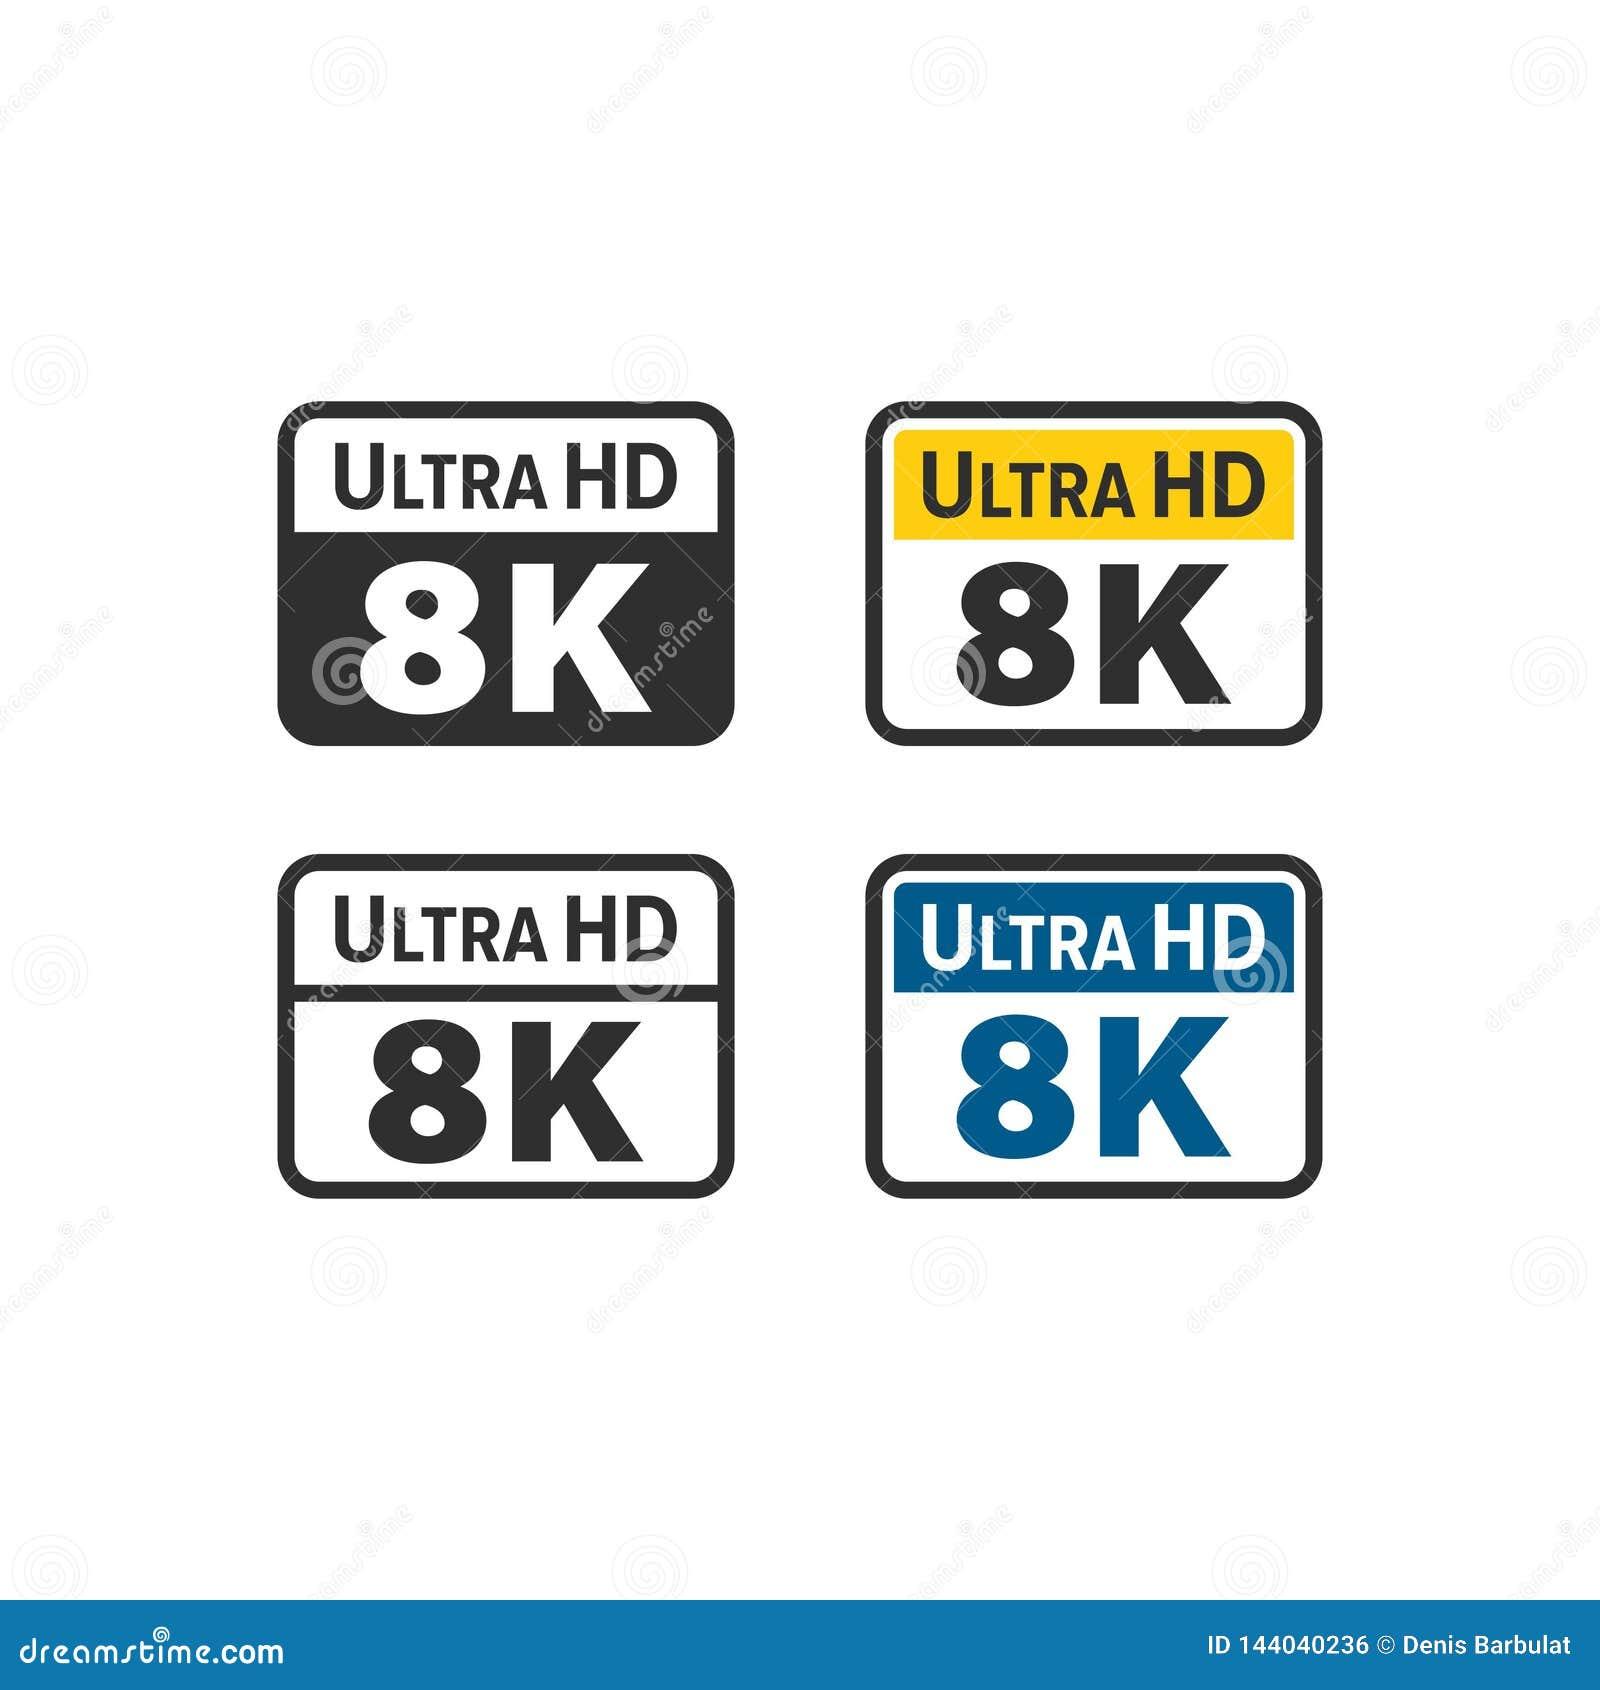 Ultra HD 8K icon